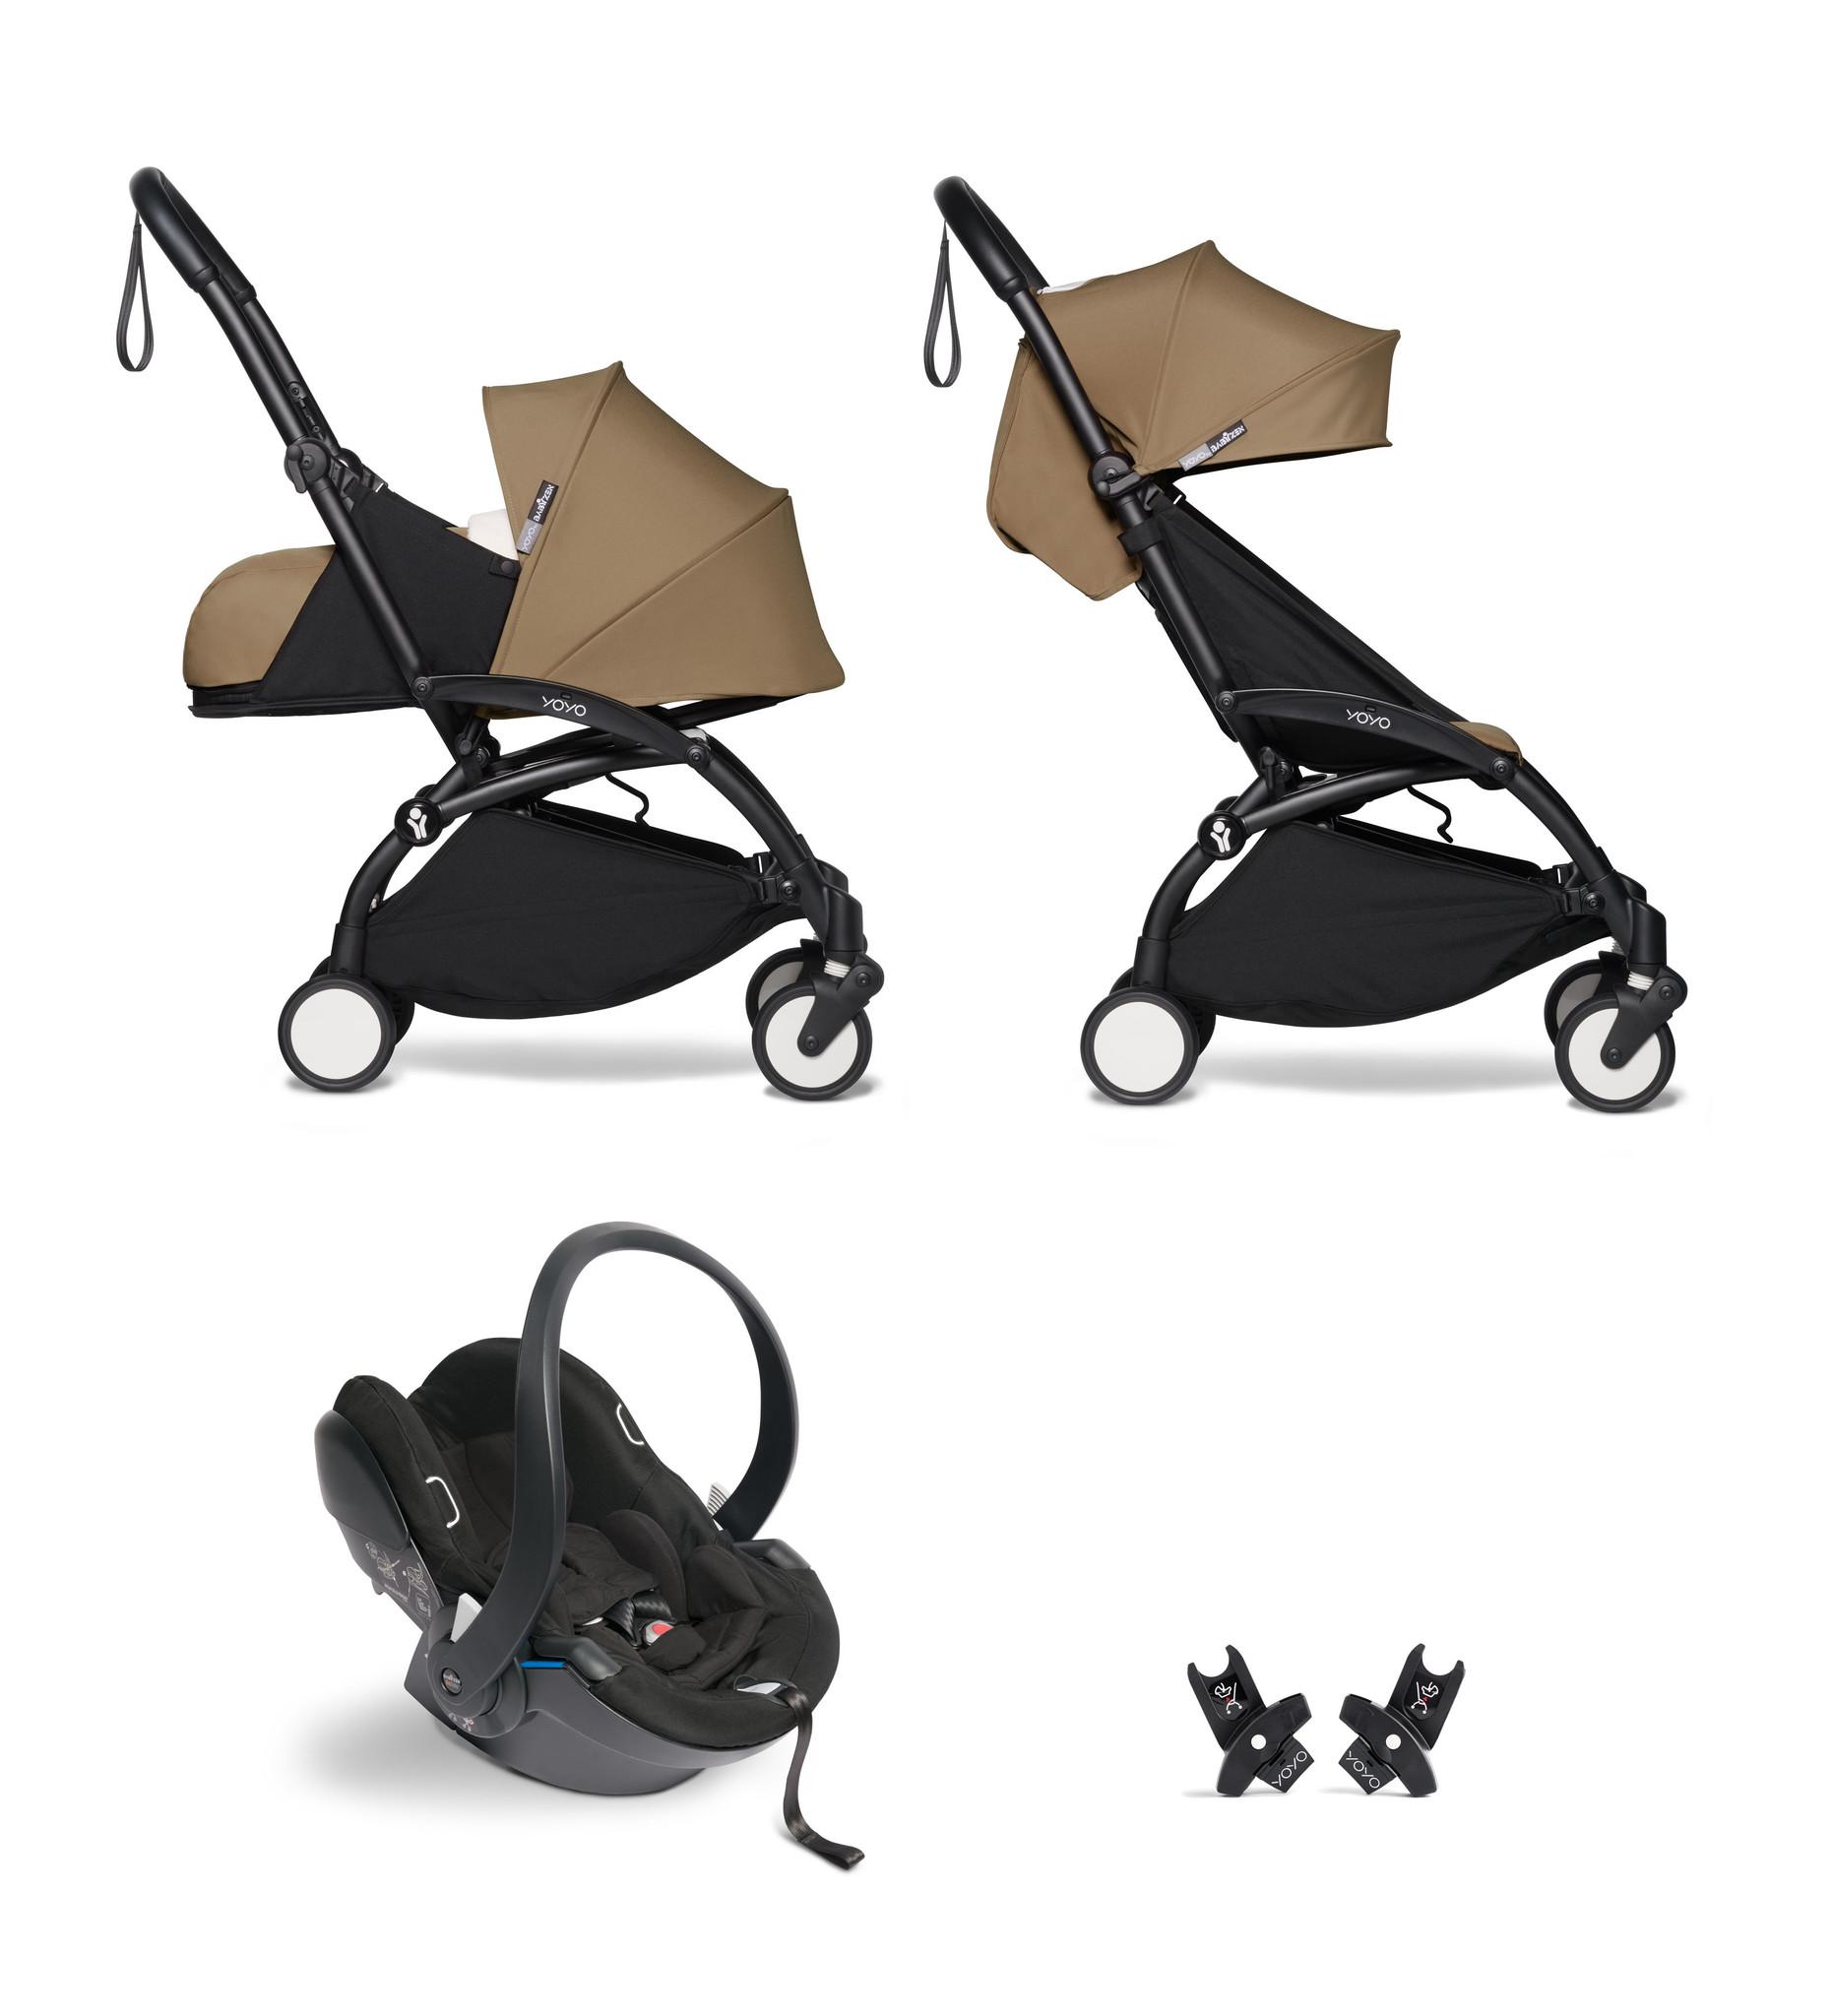 Babyzen Babyzen YOYO² buggy COMPLEET / FULL SET 0+ and 6+ toffee frame zwart incl. YOYO² BeSafe autostoel zwart